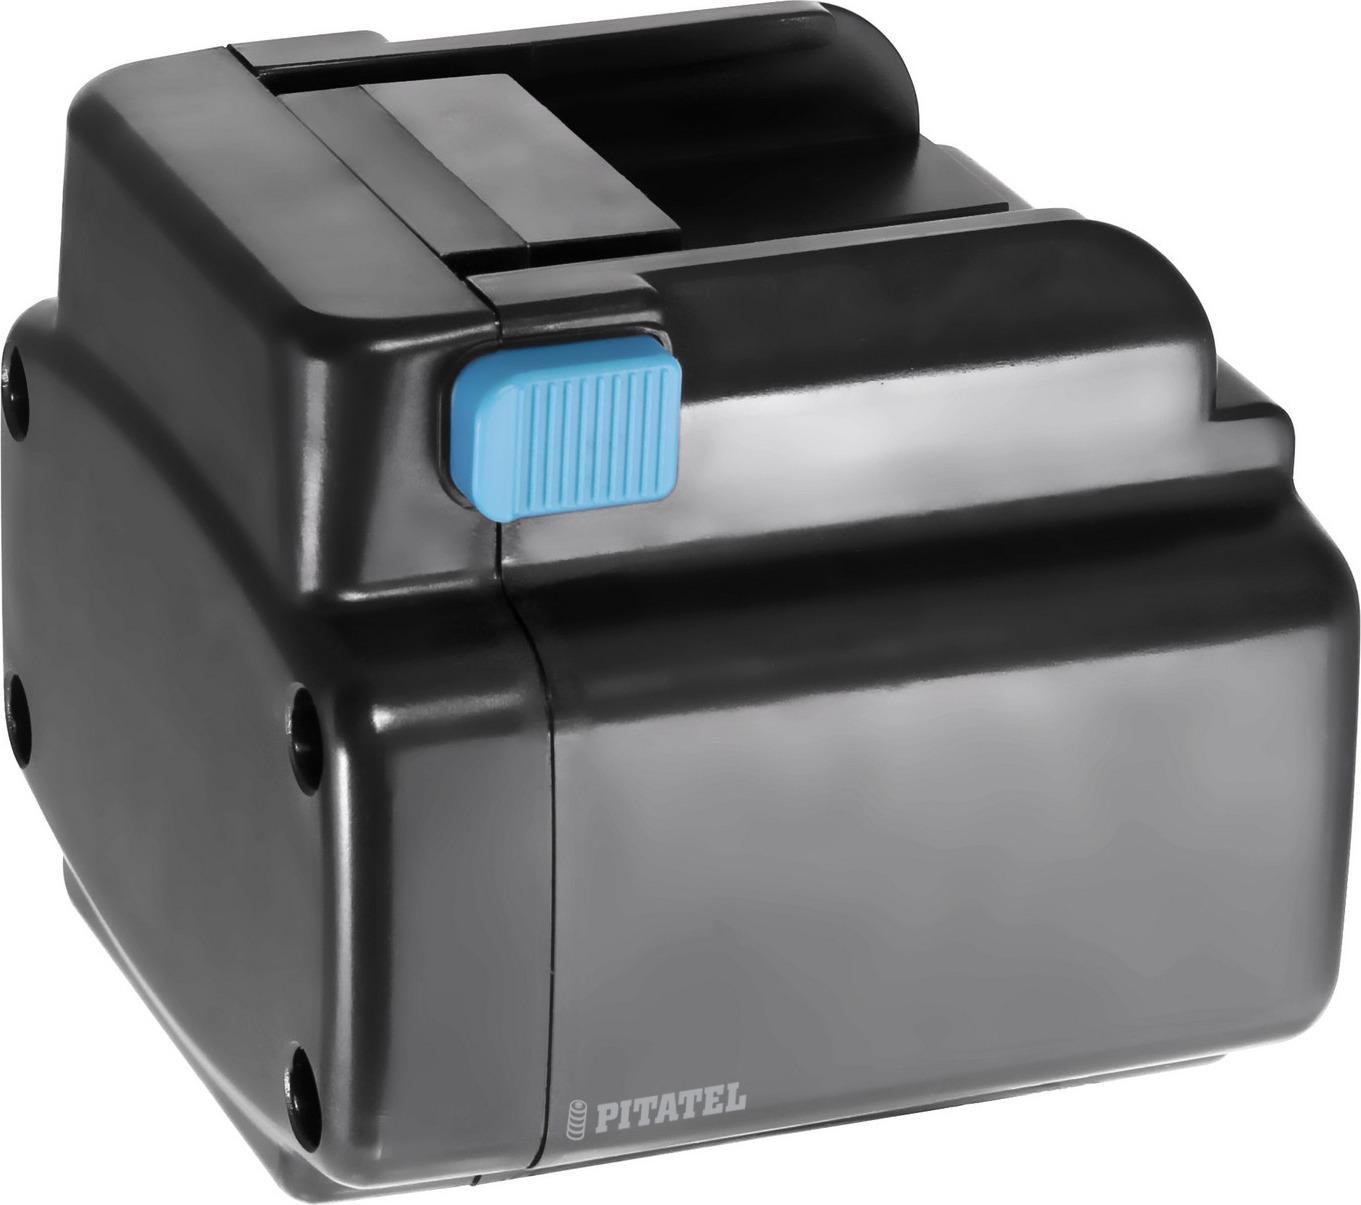 Аккумулятор для инструмента Pitatel для HITACHI. TSB-029-HIT24-30M аккумулятор для инструмента dewalt pitatel tsb 021 de24 30m черный